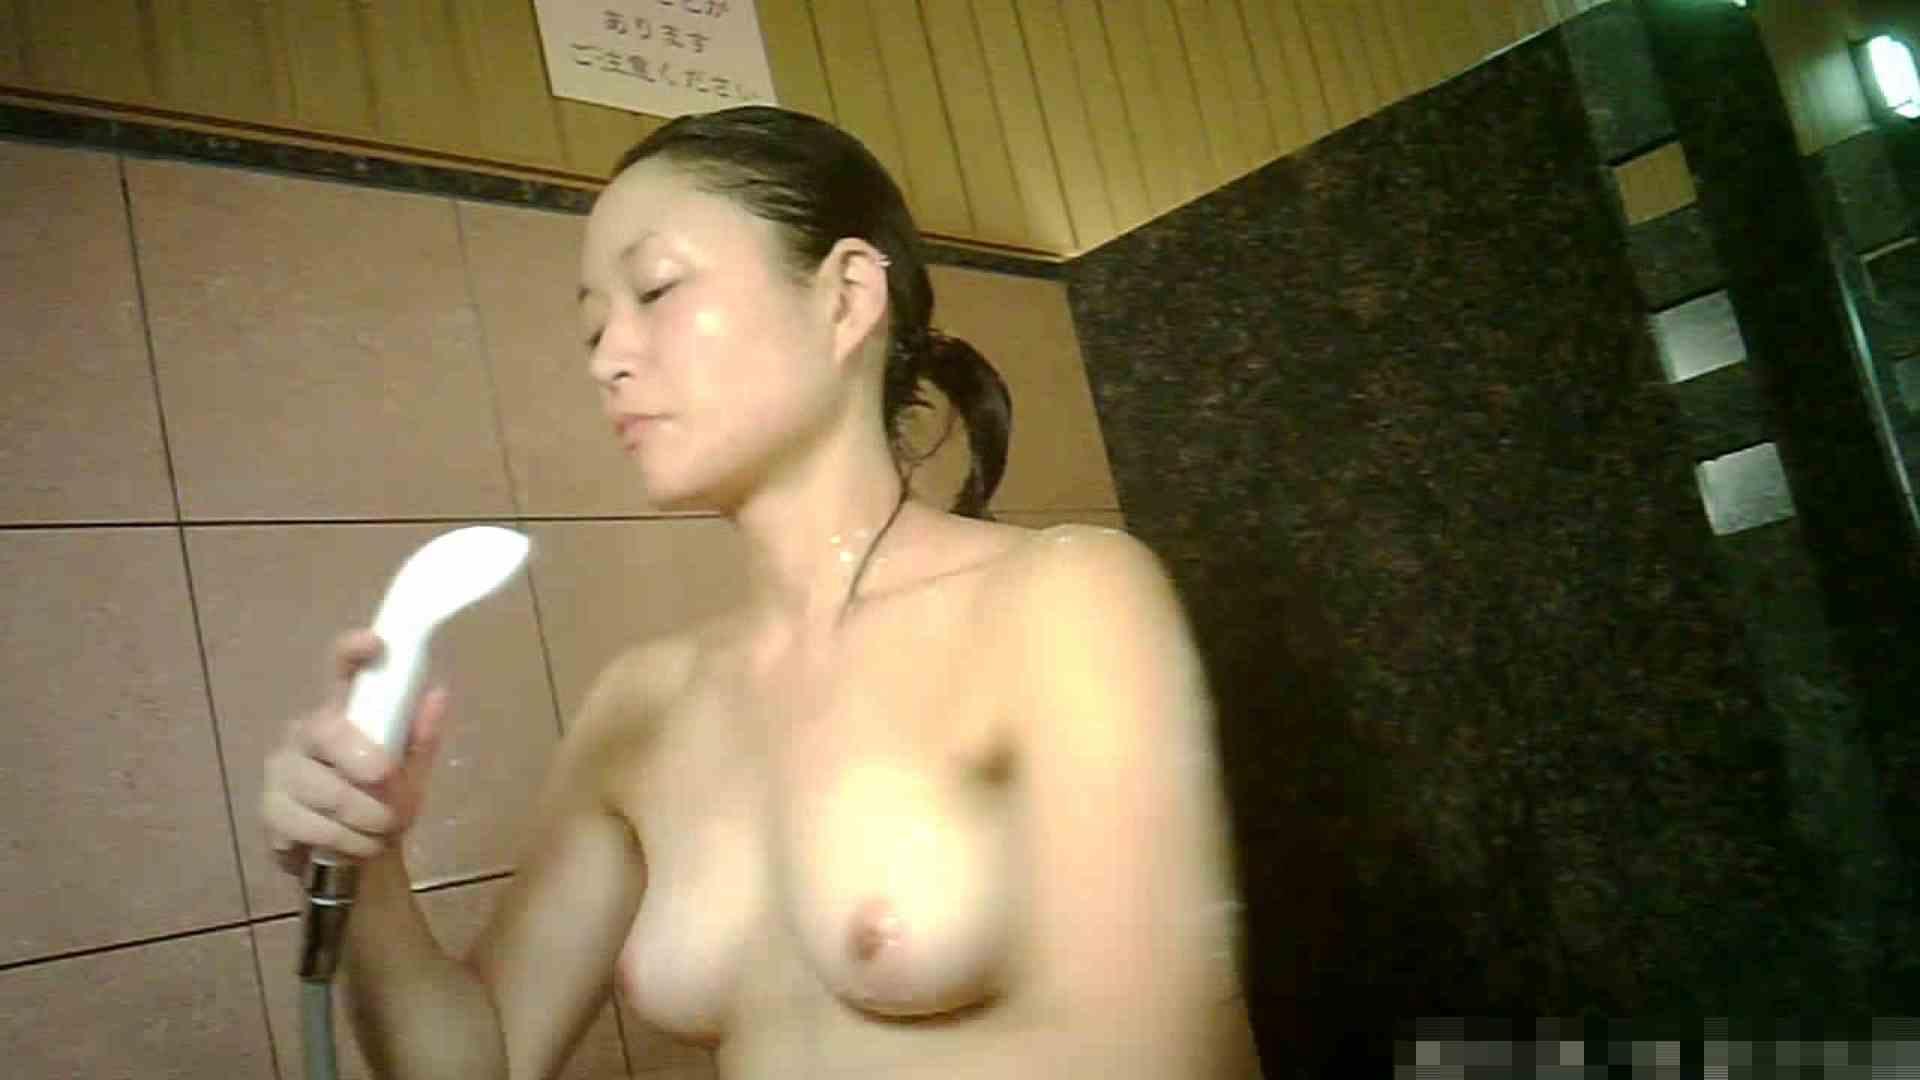 No.1 洗い場!!とっても綺麗な身体のお女市さん、乳首も綺麗です。 潜入 | 桃色乳首  98画像 73